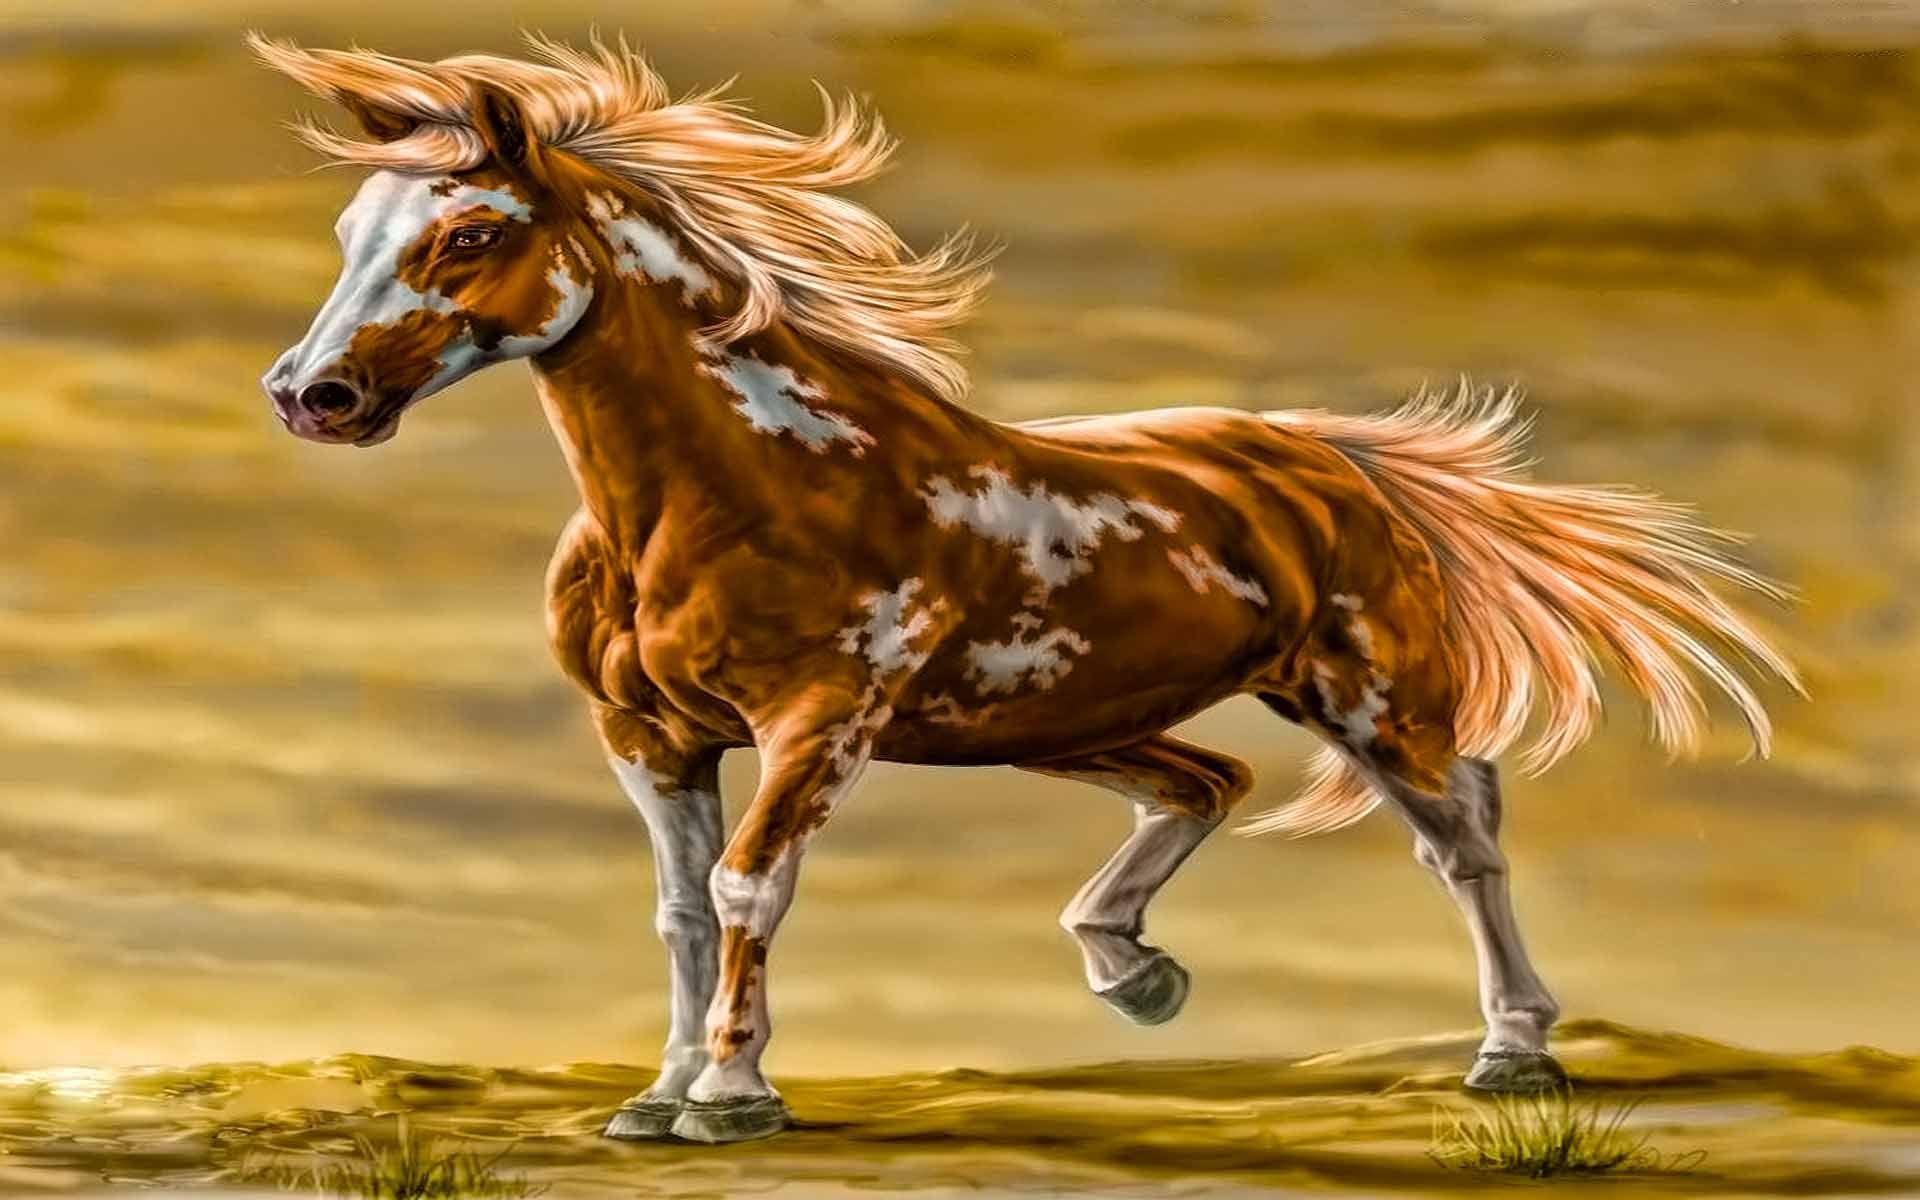 Download Wallpaper Horse Chromebook - 339785079f2388bc1c44c921dd0cfc1d  Image_607051.jpg